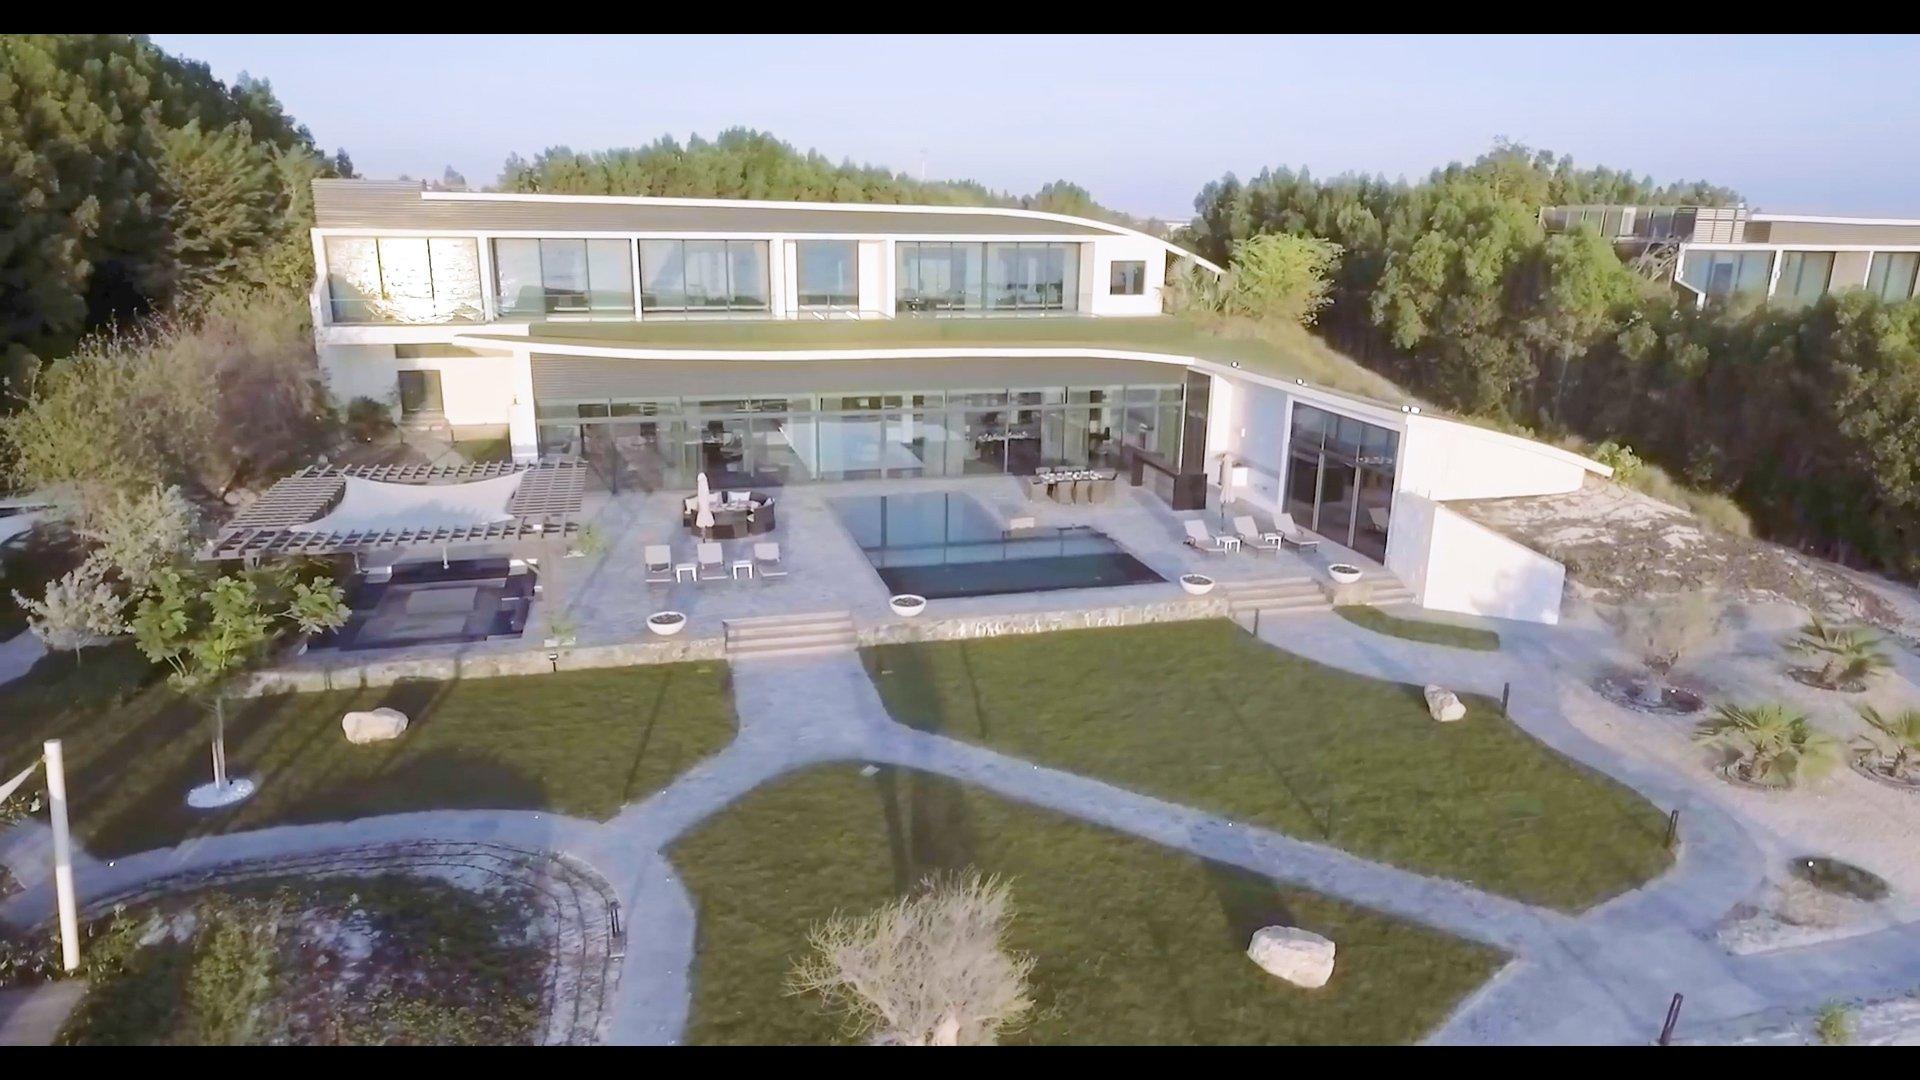 Villa in Abu Dhabi, Abu Dhabi, United Arab Emirates 1 - 11438418